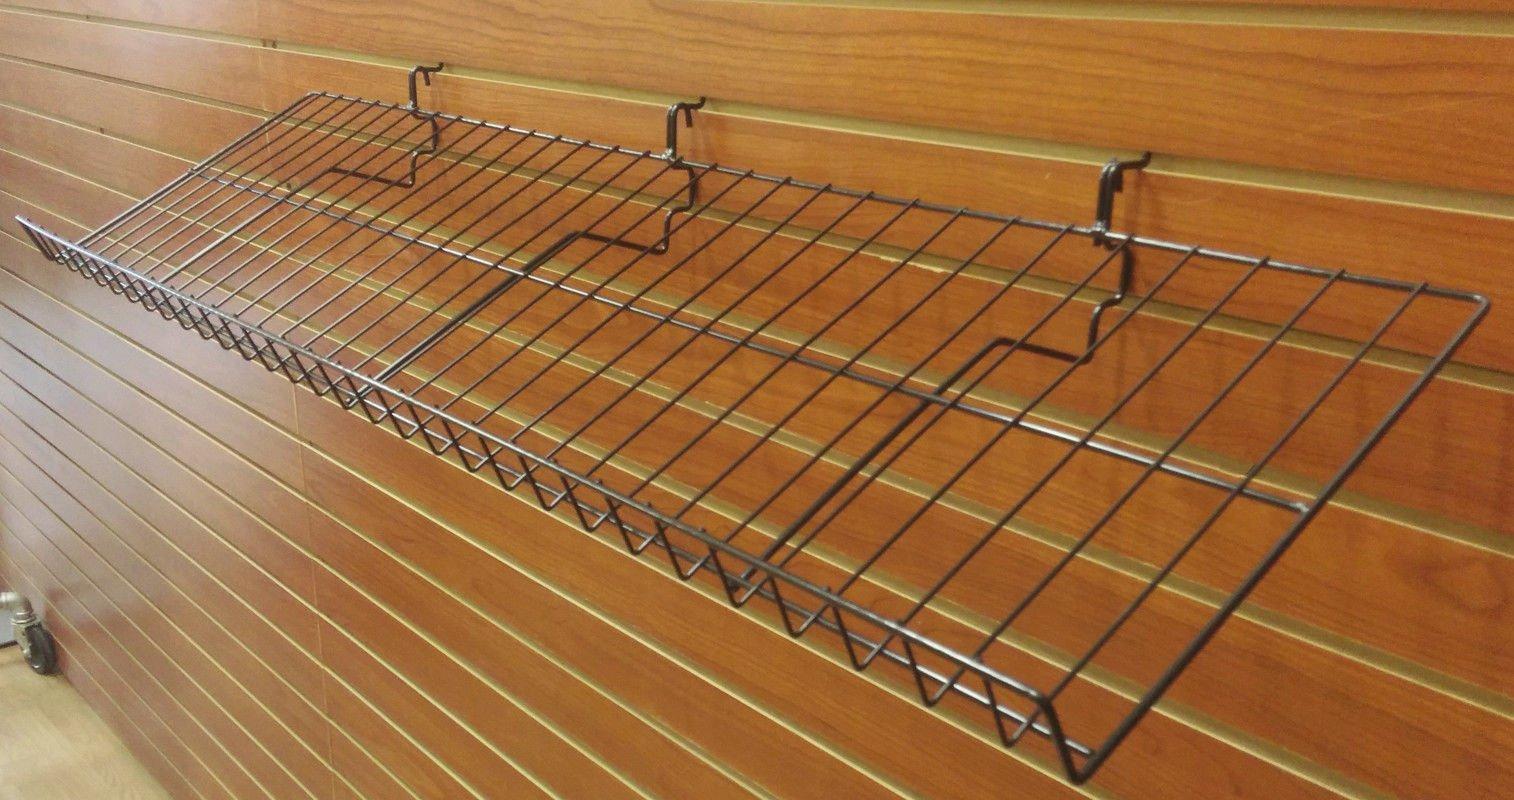 Slatwall, Pegboard, Gridwall Slanted Angled POP Retail Display Candy Shelf - 6'' D x 46'' L - 5 Pack